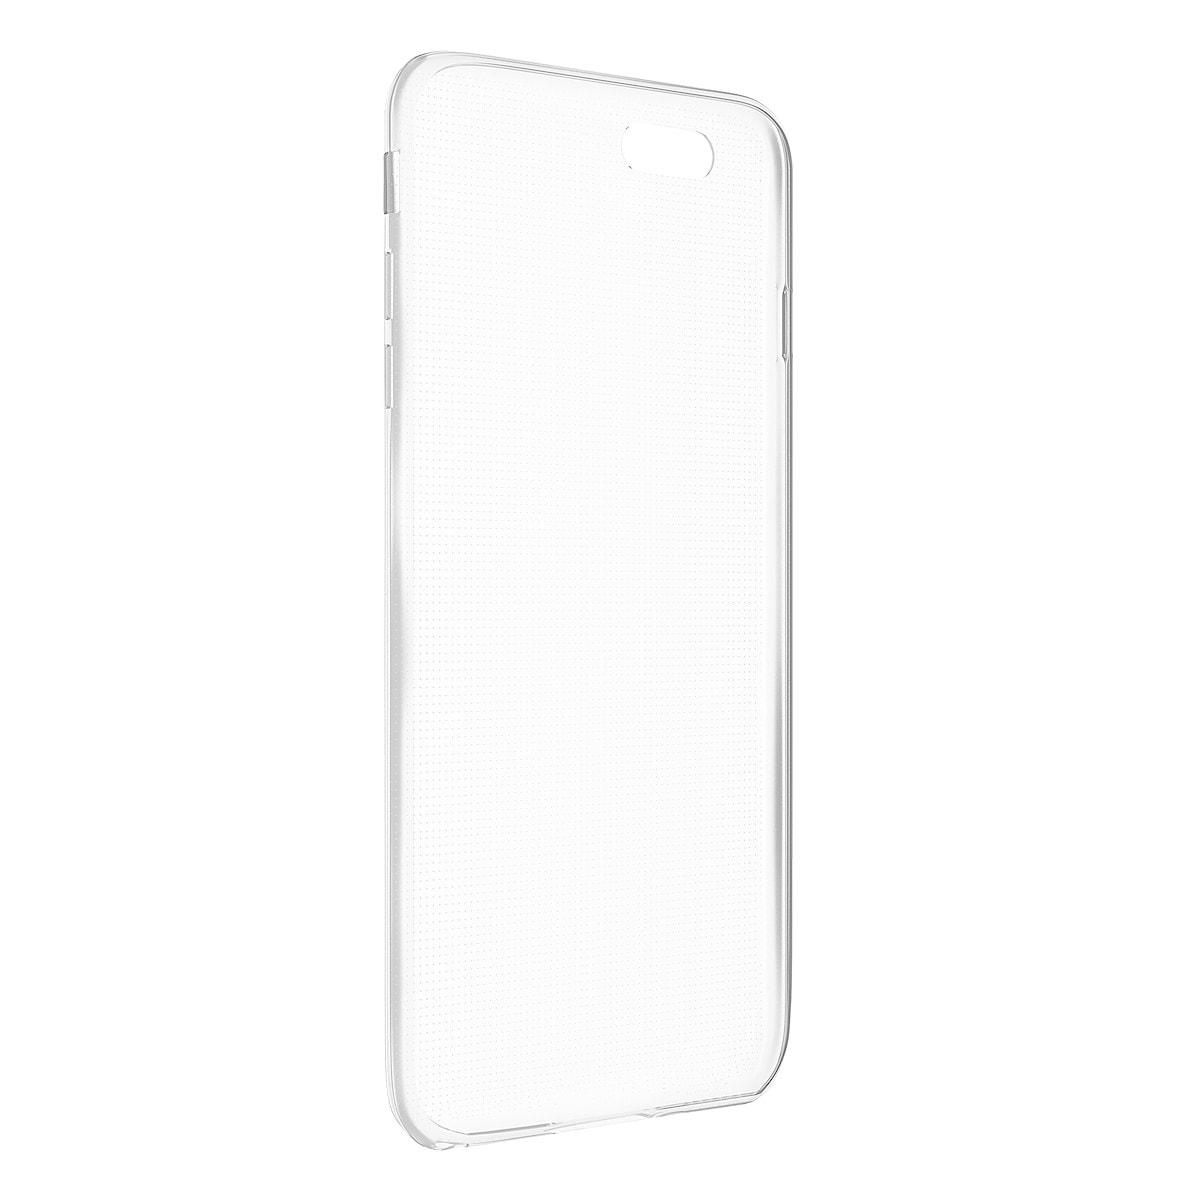 Mobilskal för iPhone 6 Plus/6S Plus Easy Grip